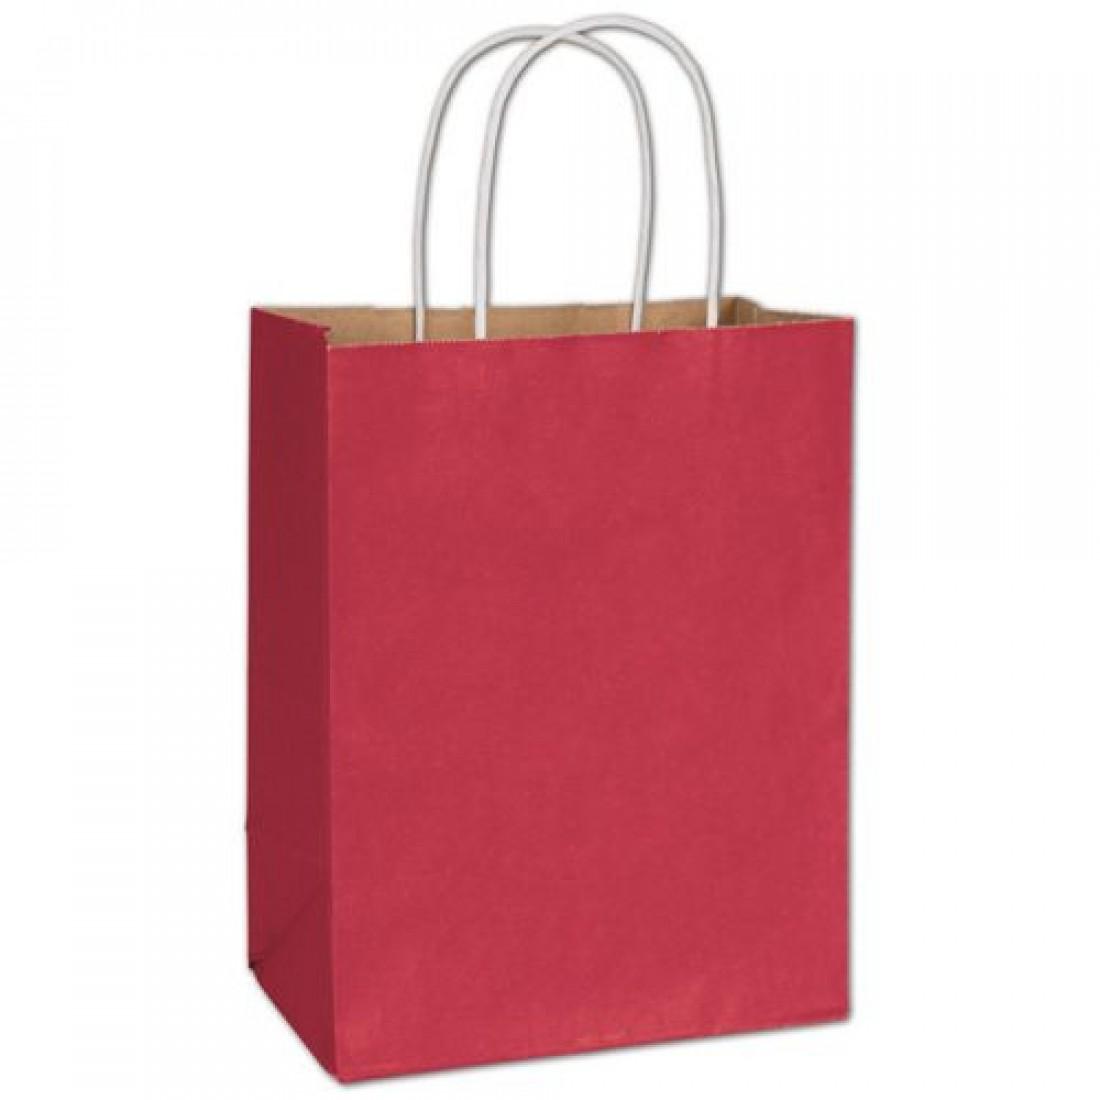 Crimson Cub Shopper